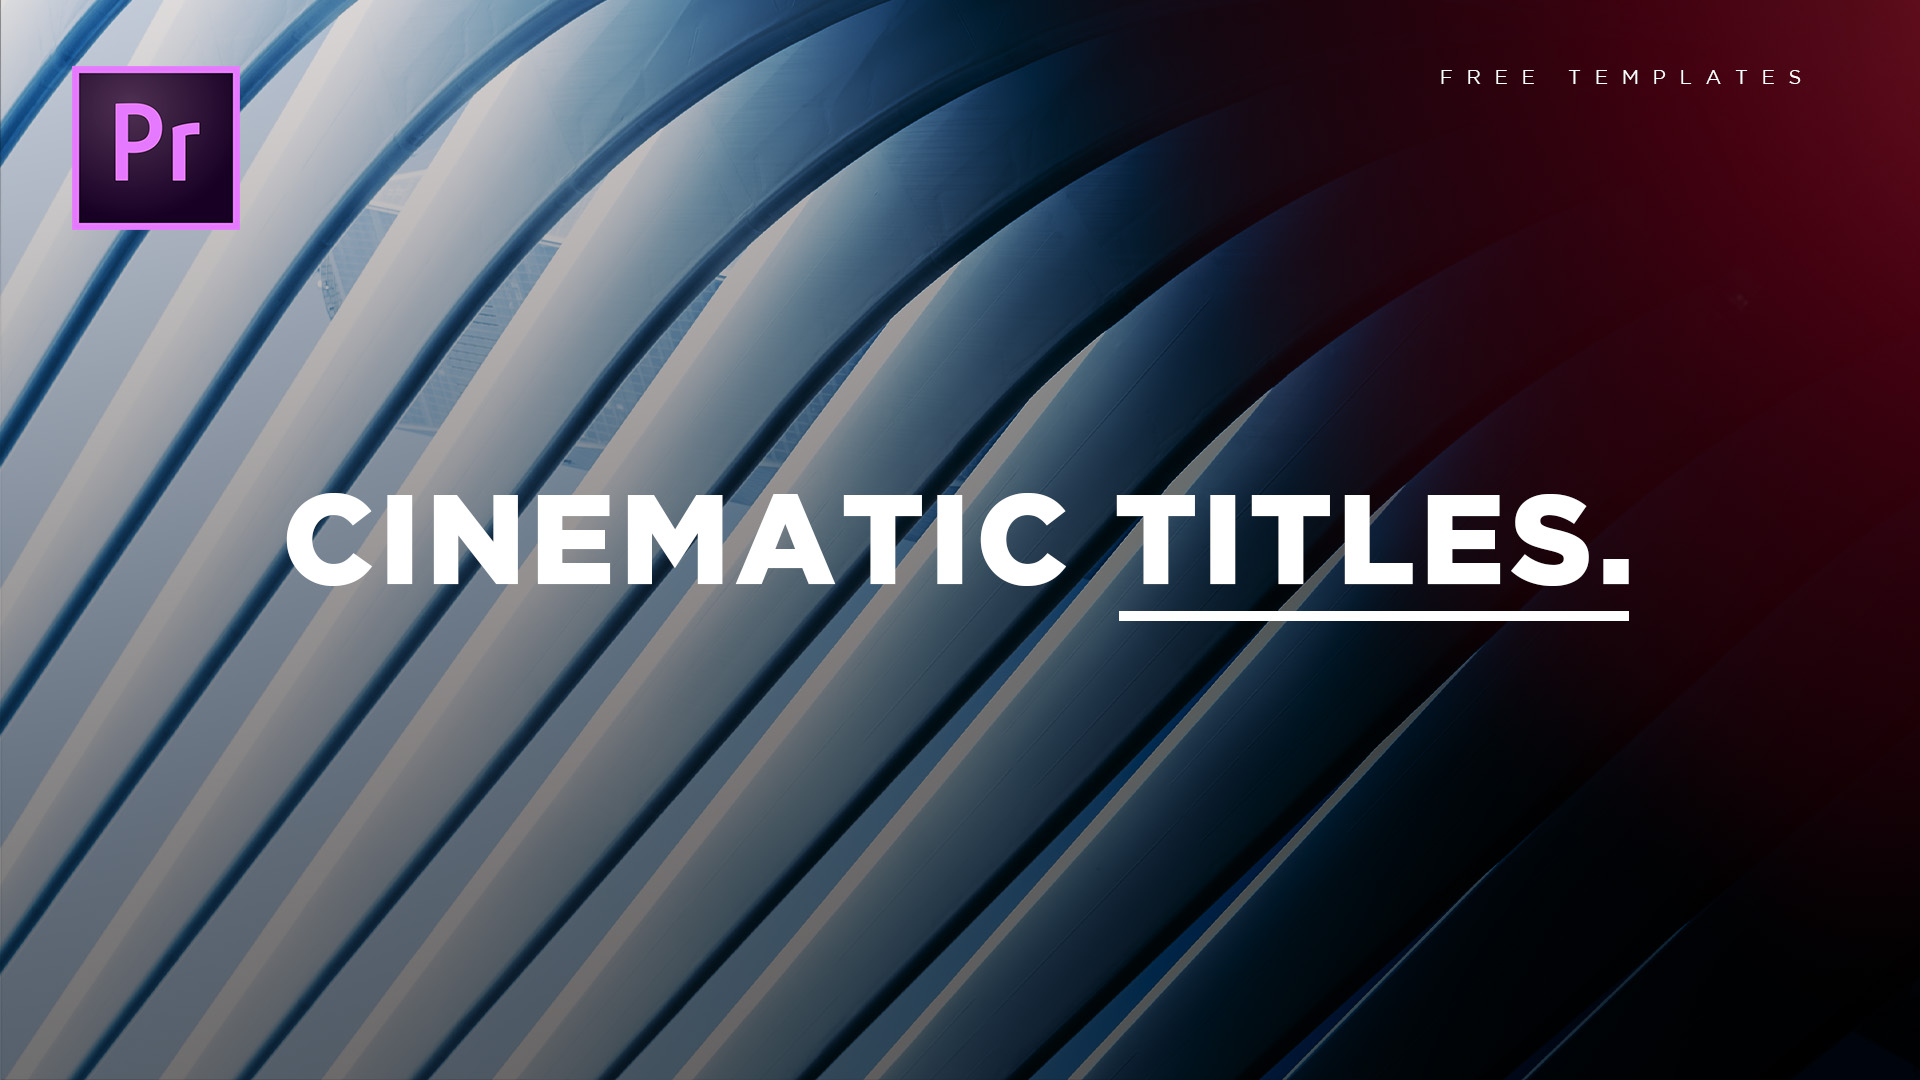 Thumbnail Cinematic Titles 2.0.jpg